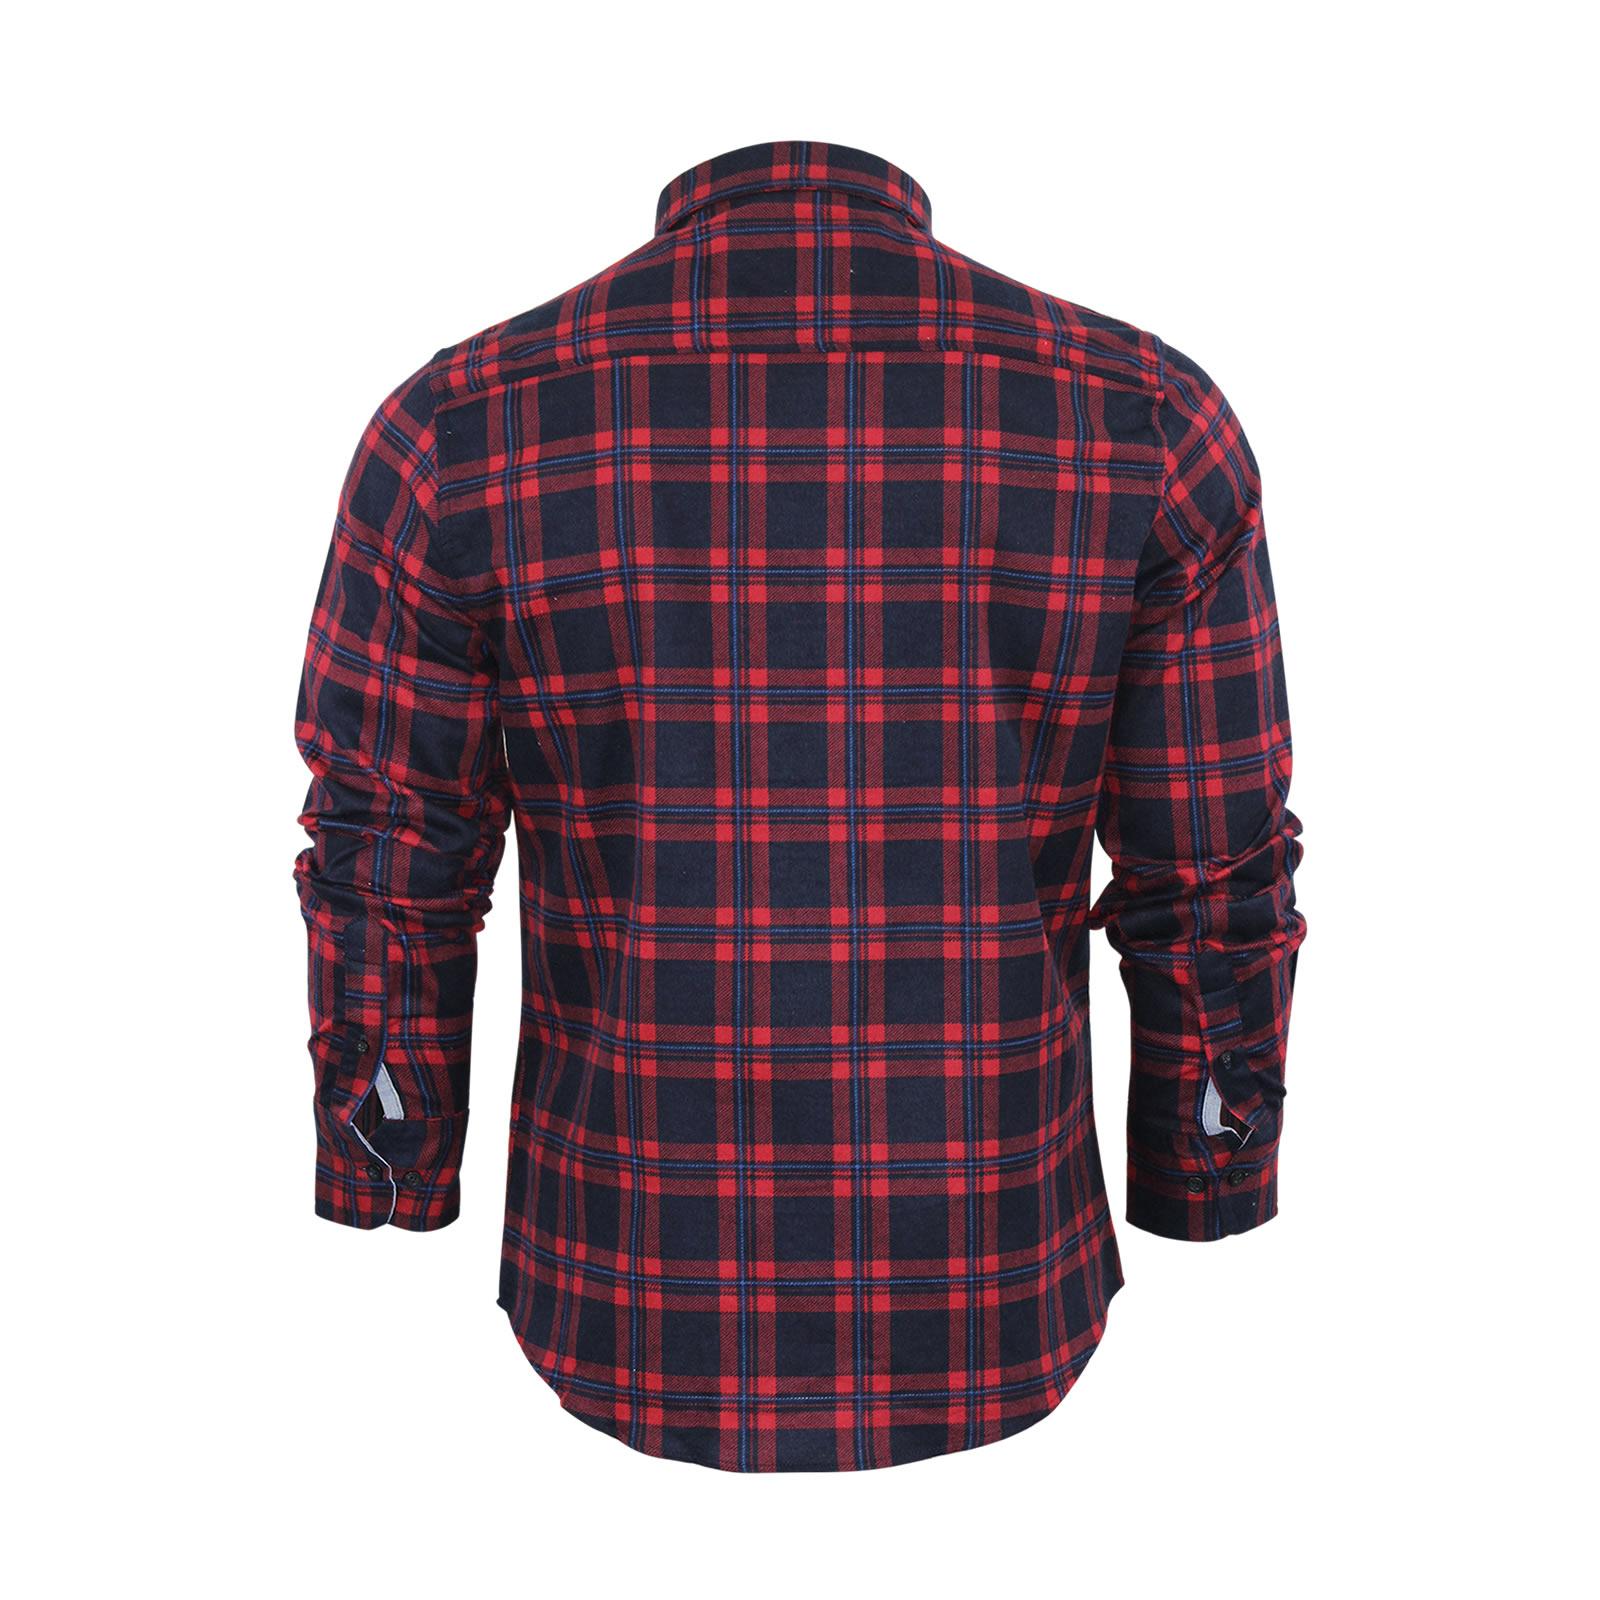 Mens check shirt brave soul flannel brushed cotton long for Men s lightweight flannel shirts